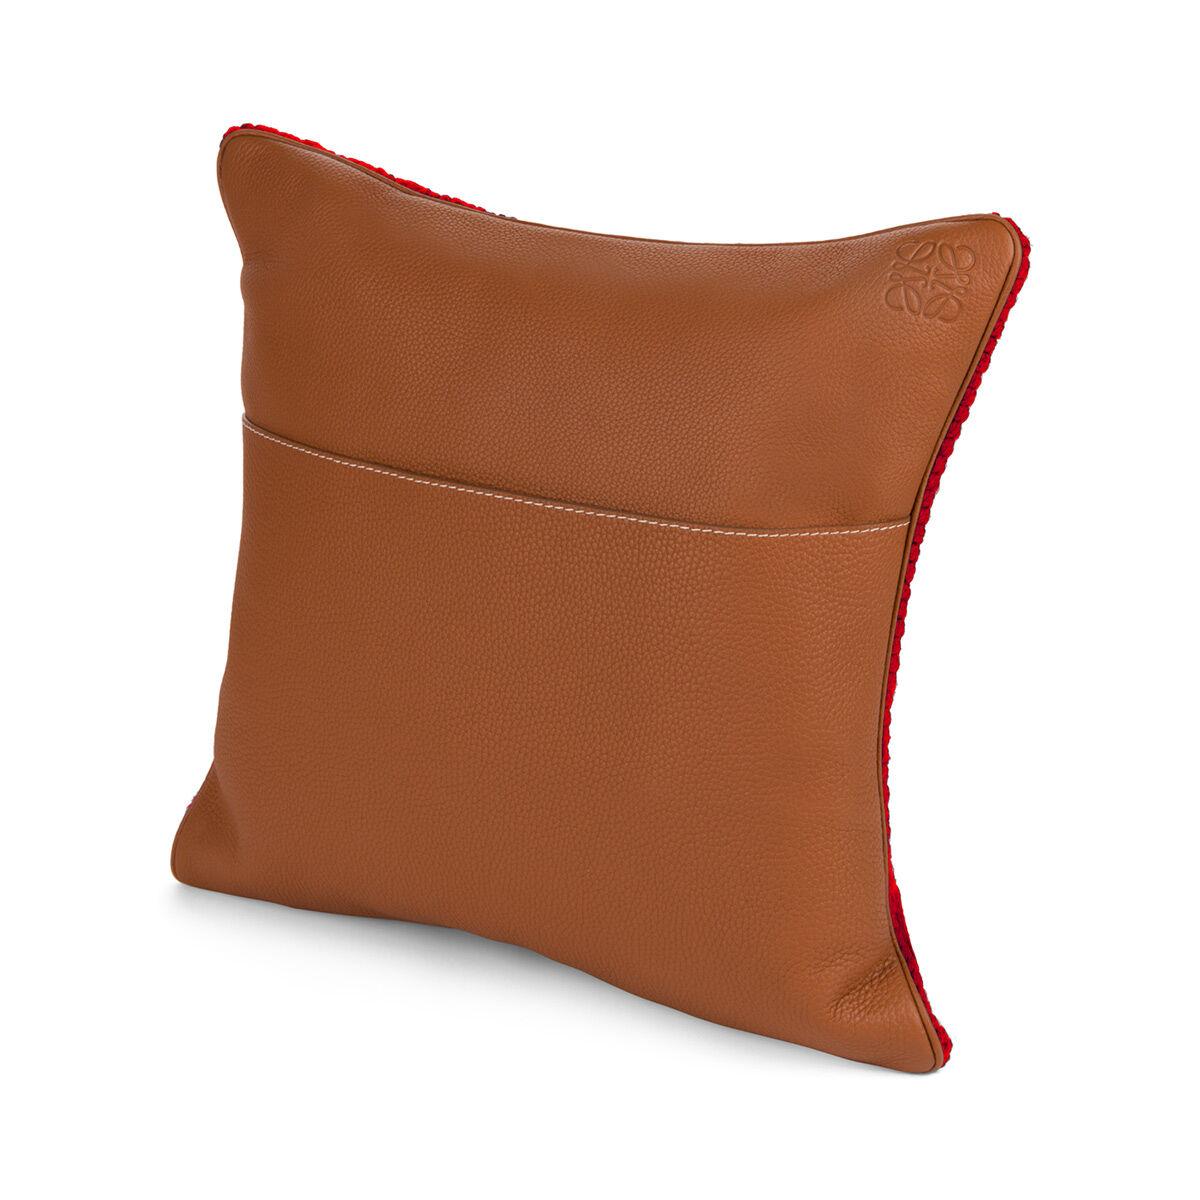 LOEWE Hand Knitted Cushion 6 40X40 レッド/ブルー all